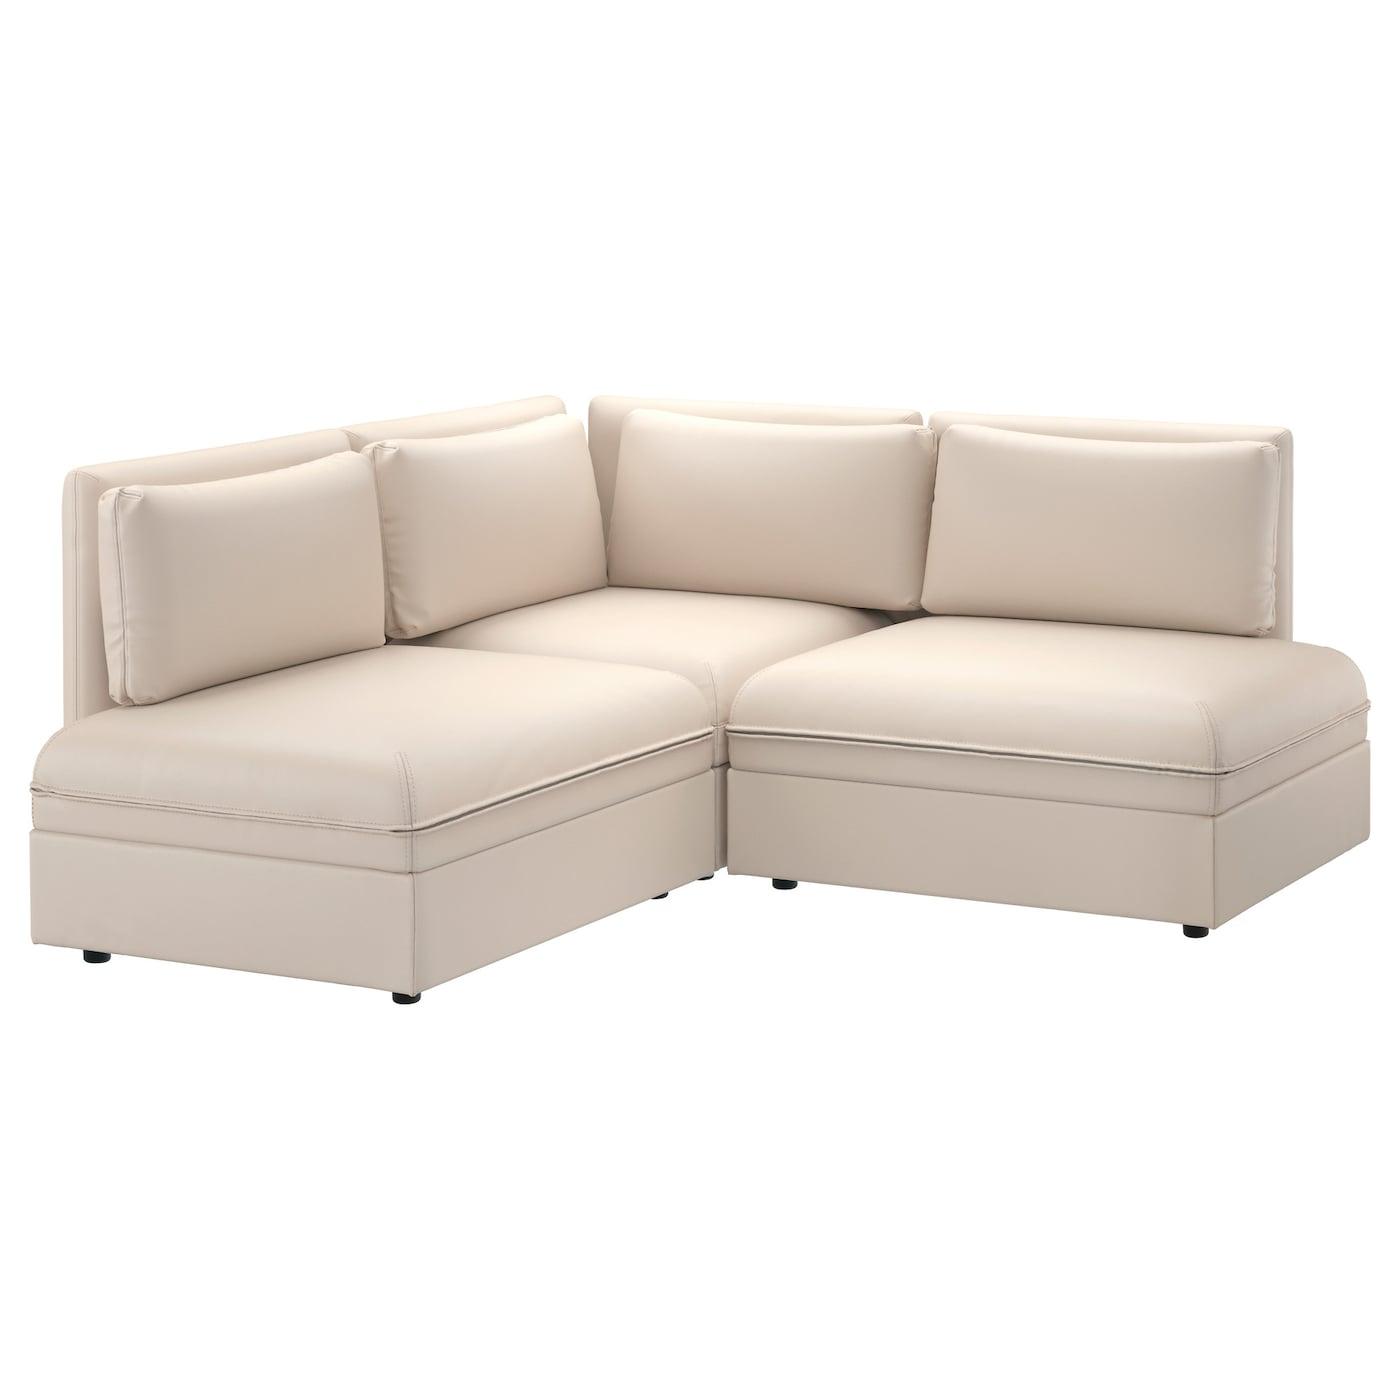 vallentuna canap d 39 angle 3 places murum beige ikea. Black Bedroom Furniture Sets. Home Design Ideas